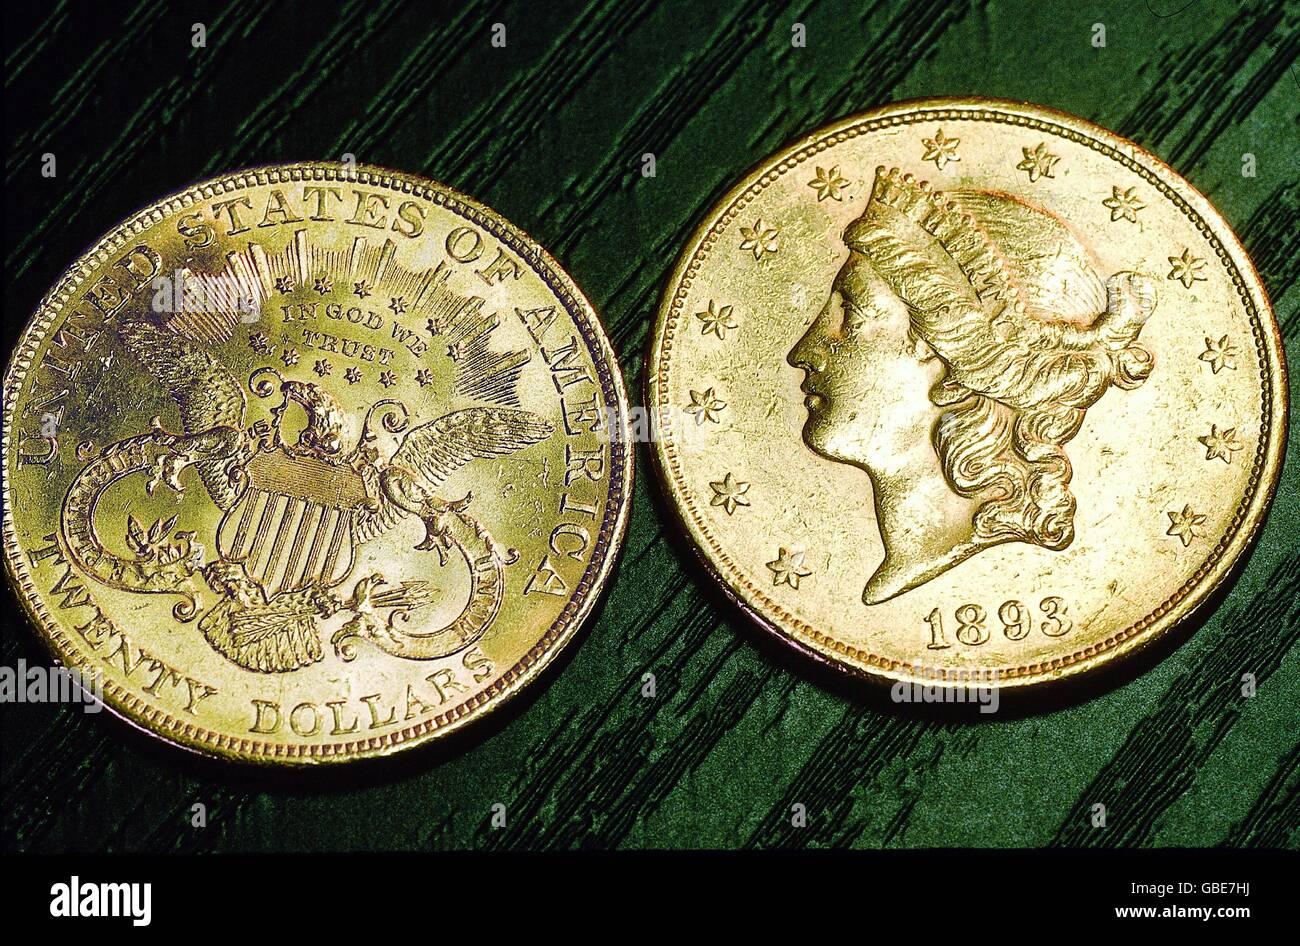 Geldfinanzen Münzen Usa 20 Dollar Goldmünze Double Eagle 1893